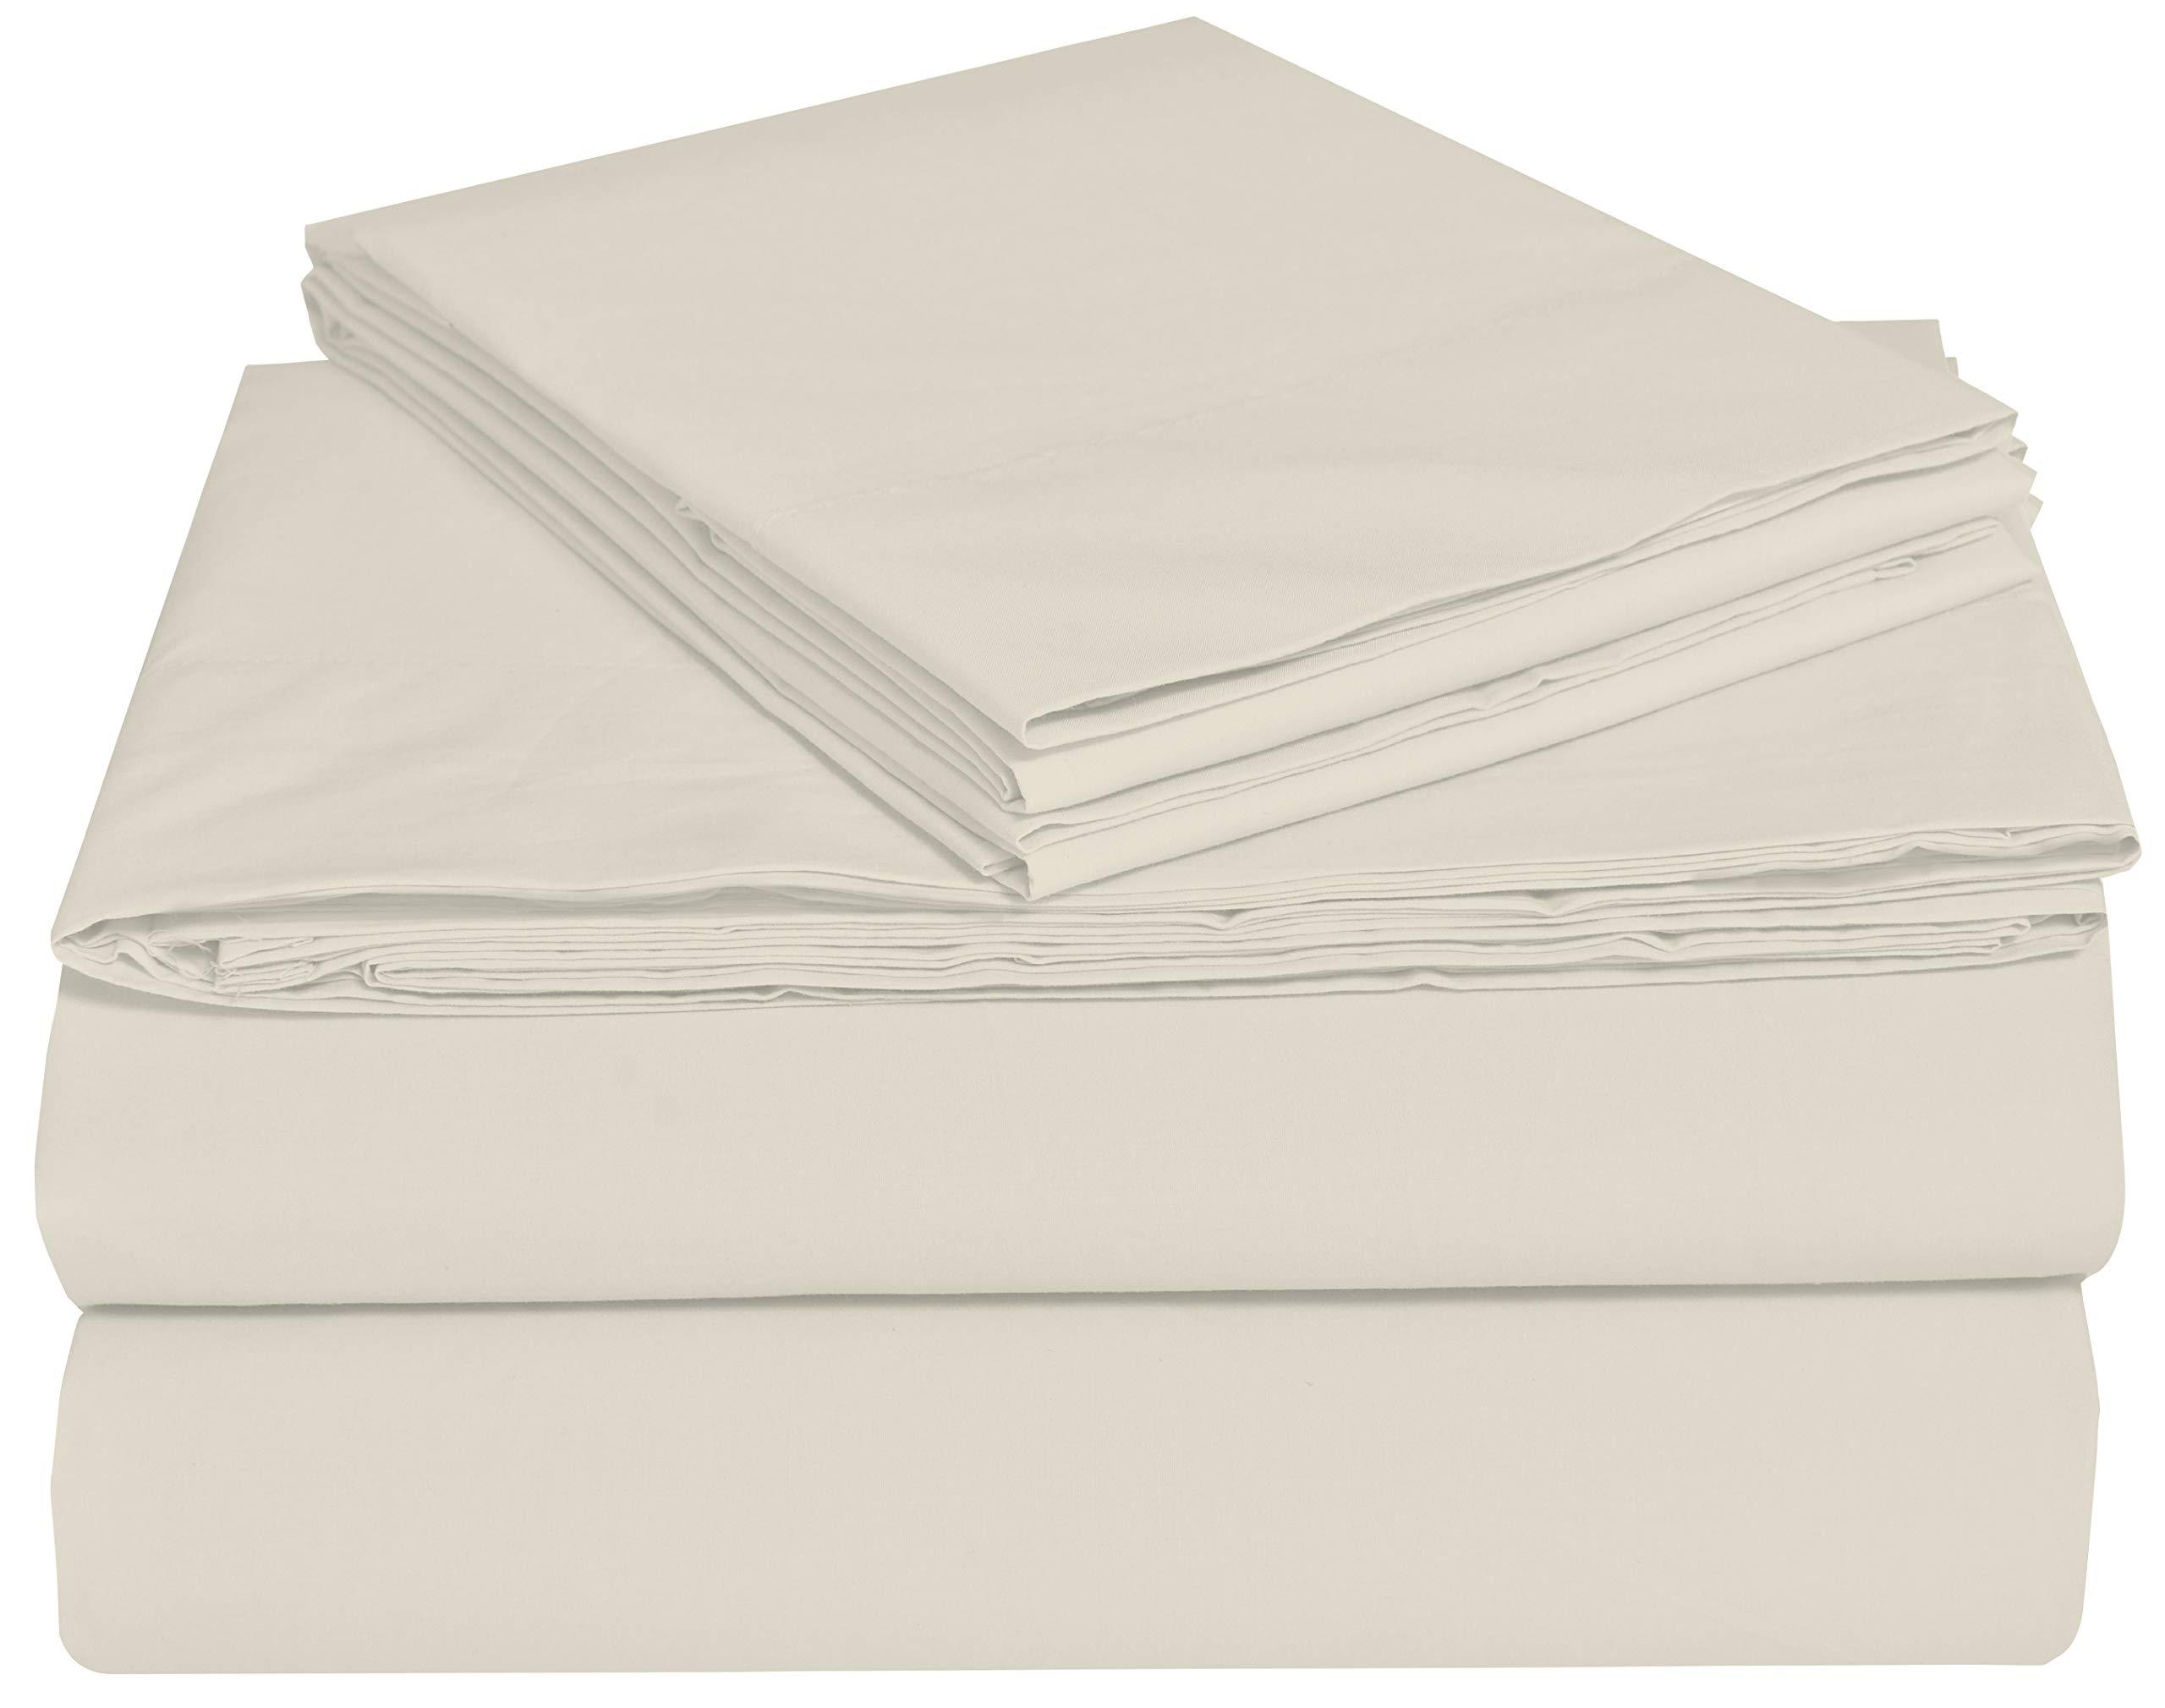 EnvioHome GOTS Certified Organic Cotton Sheet Set - 4 Pc - Natural, King